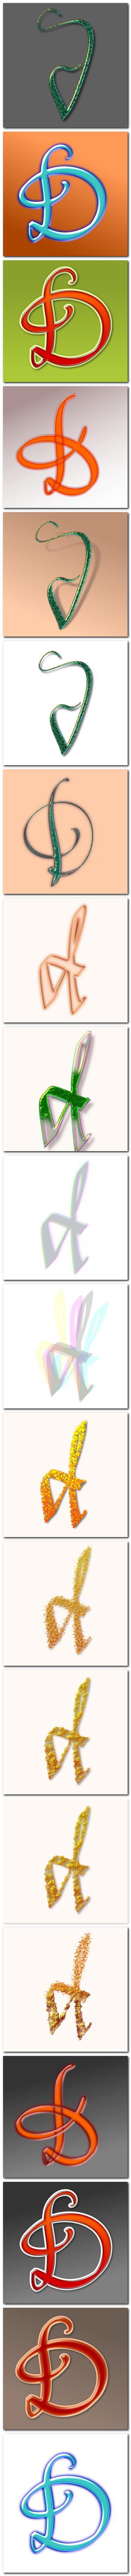 Litera d pentru lettercult - AlphaBattle 2 - de florinf